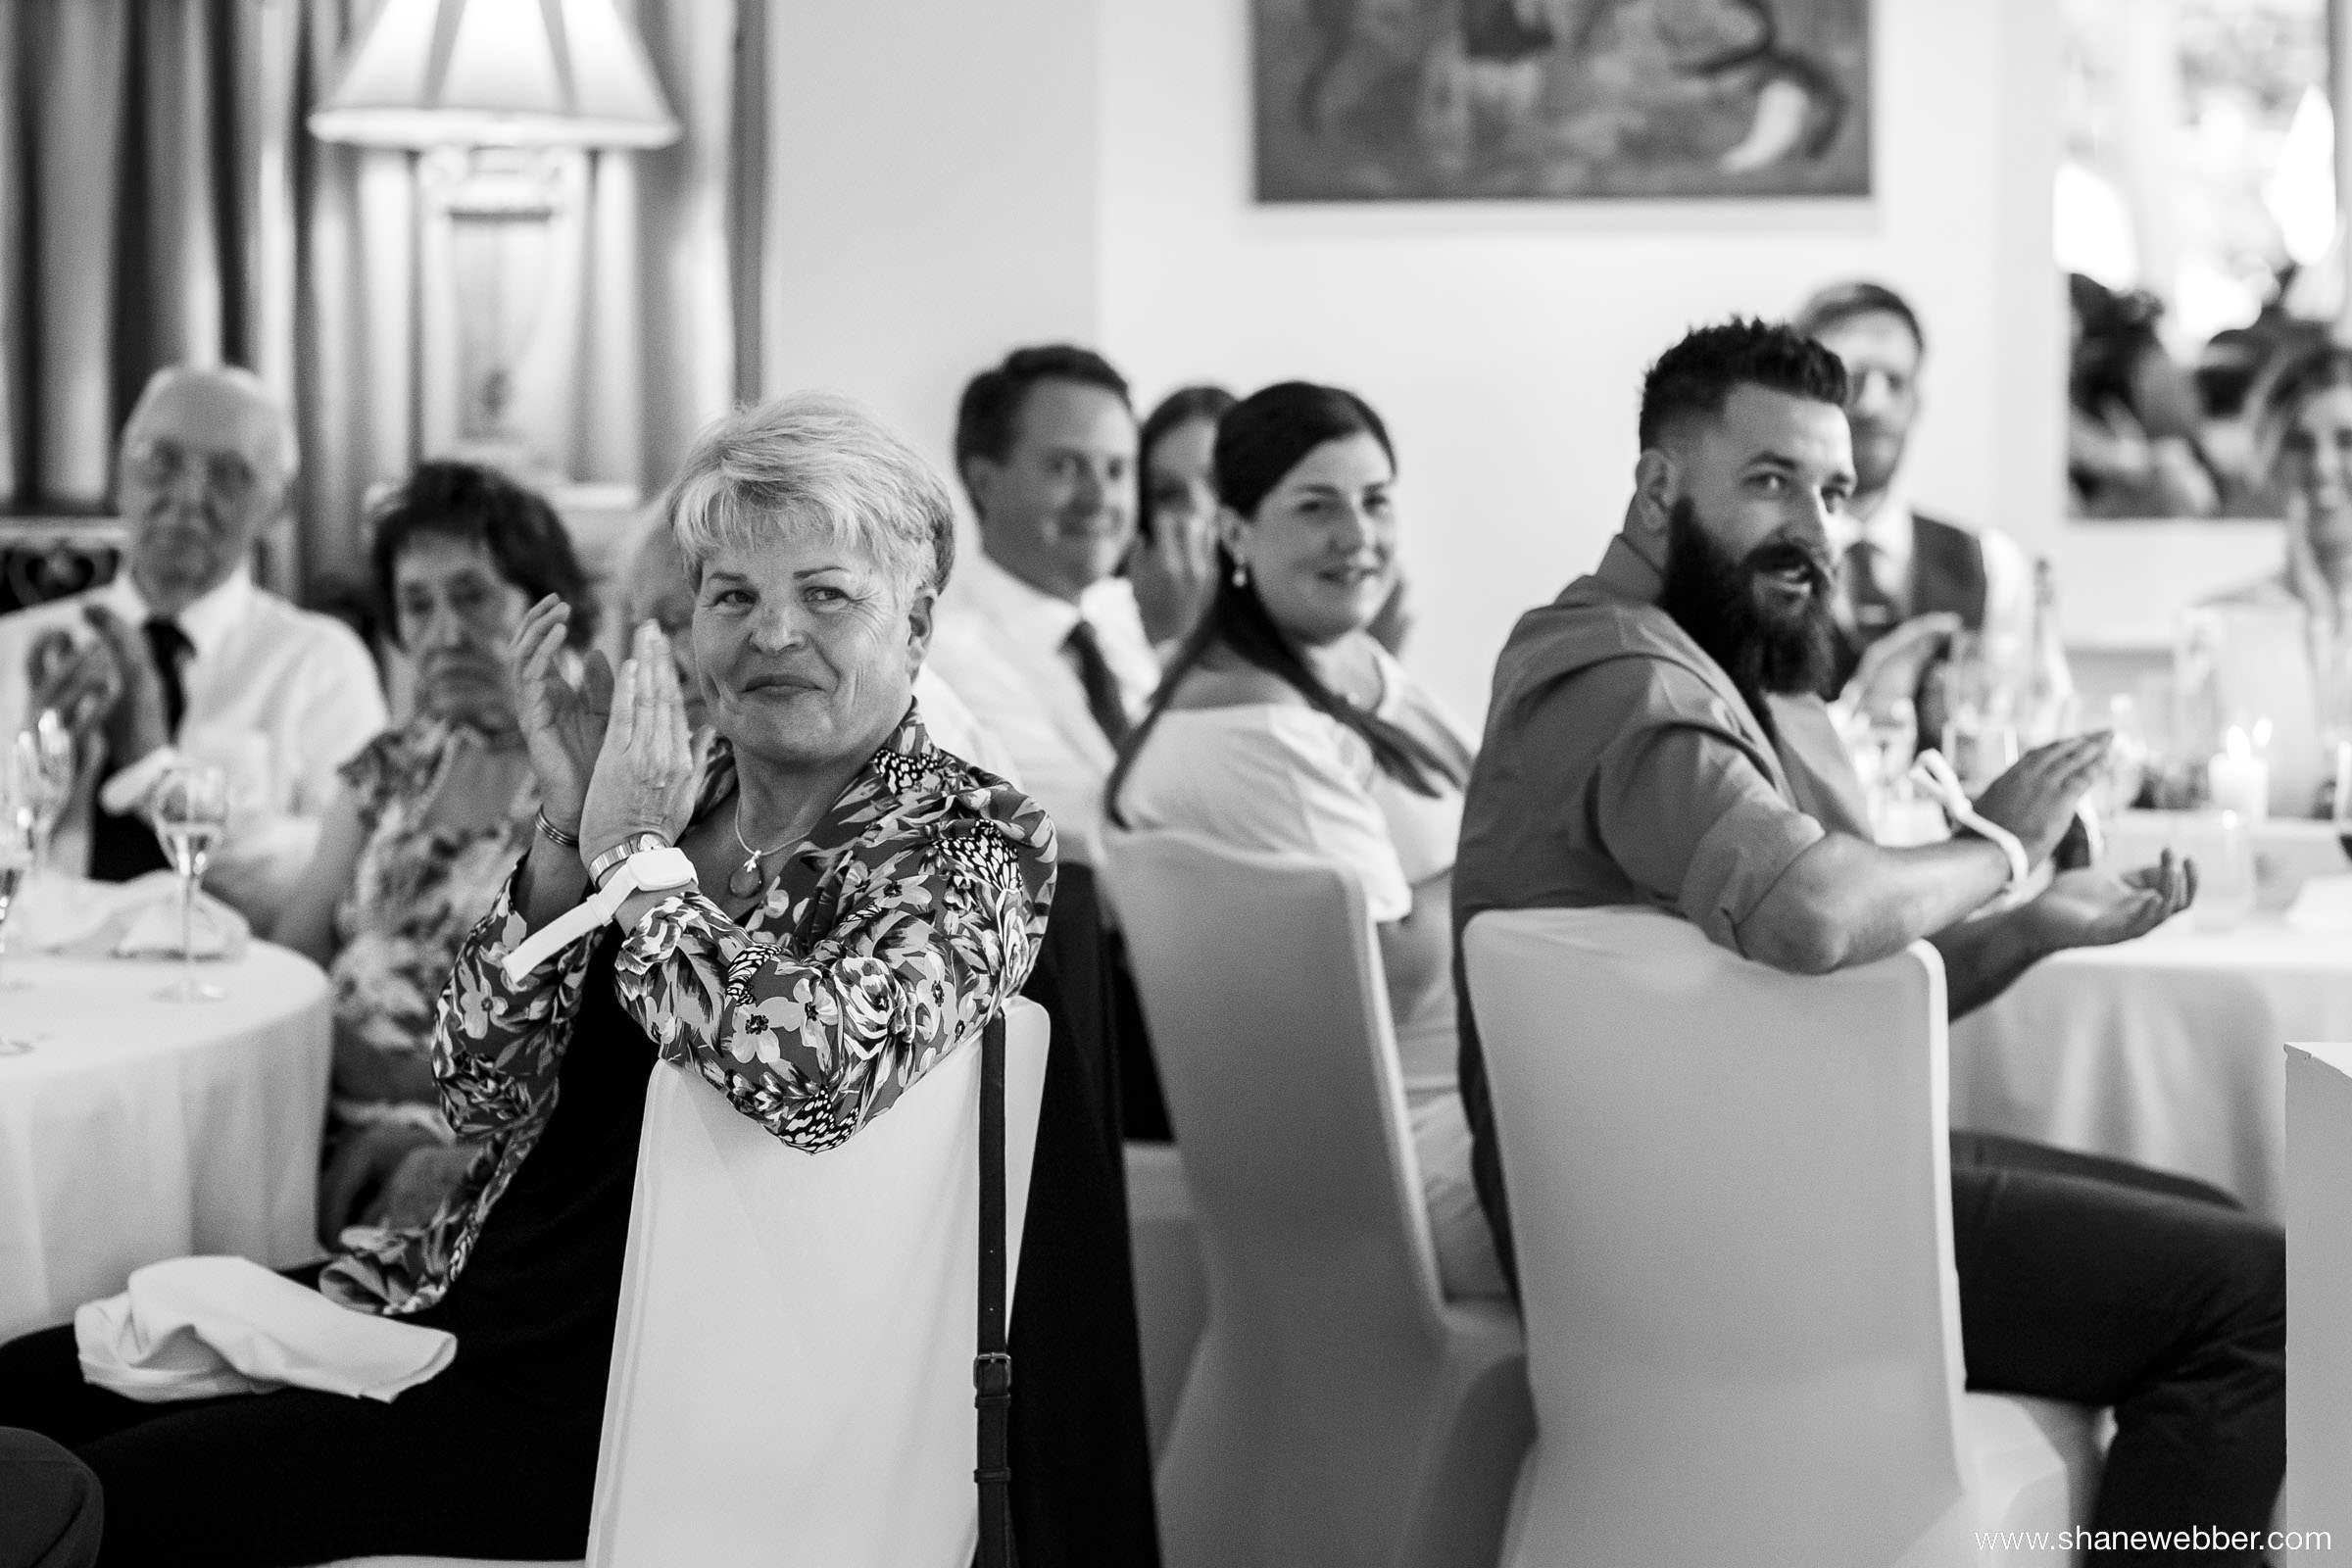 Wedding reception at the Yellow Broom Restaurant